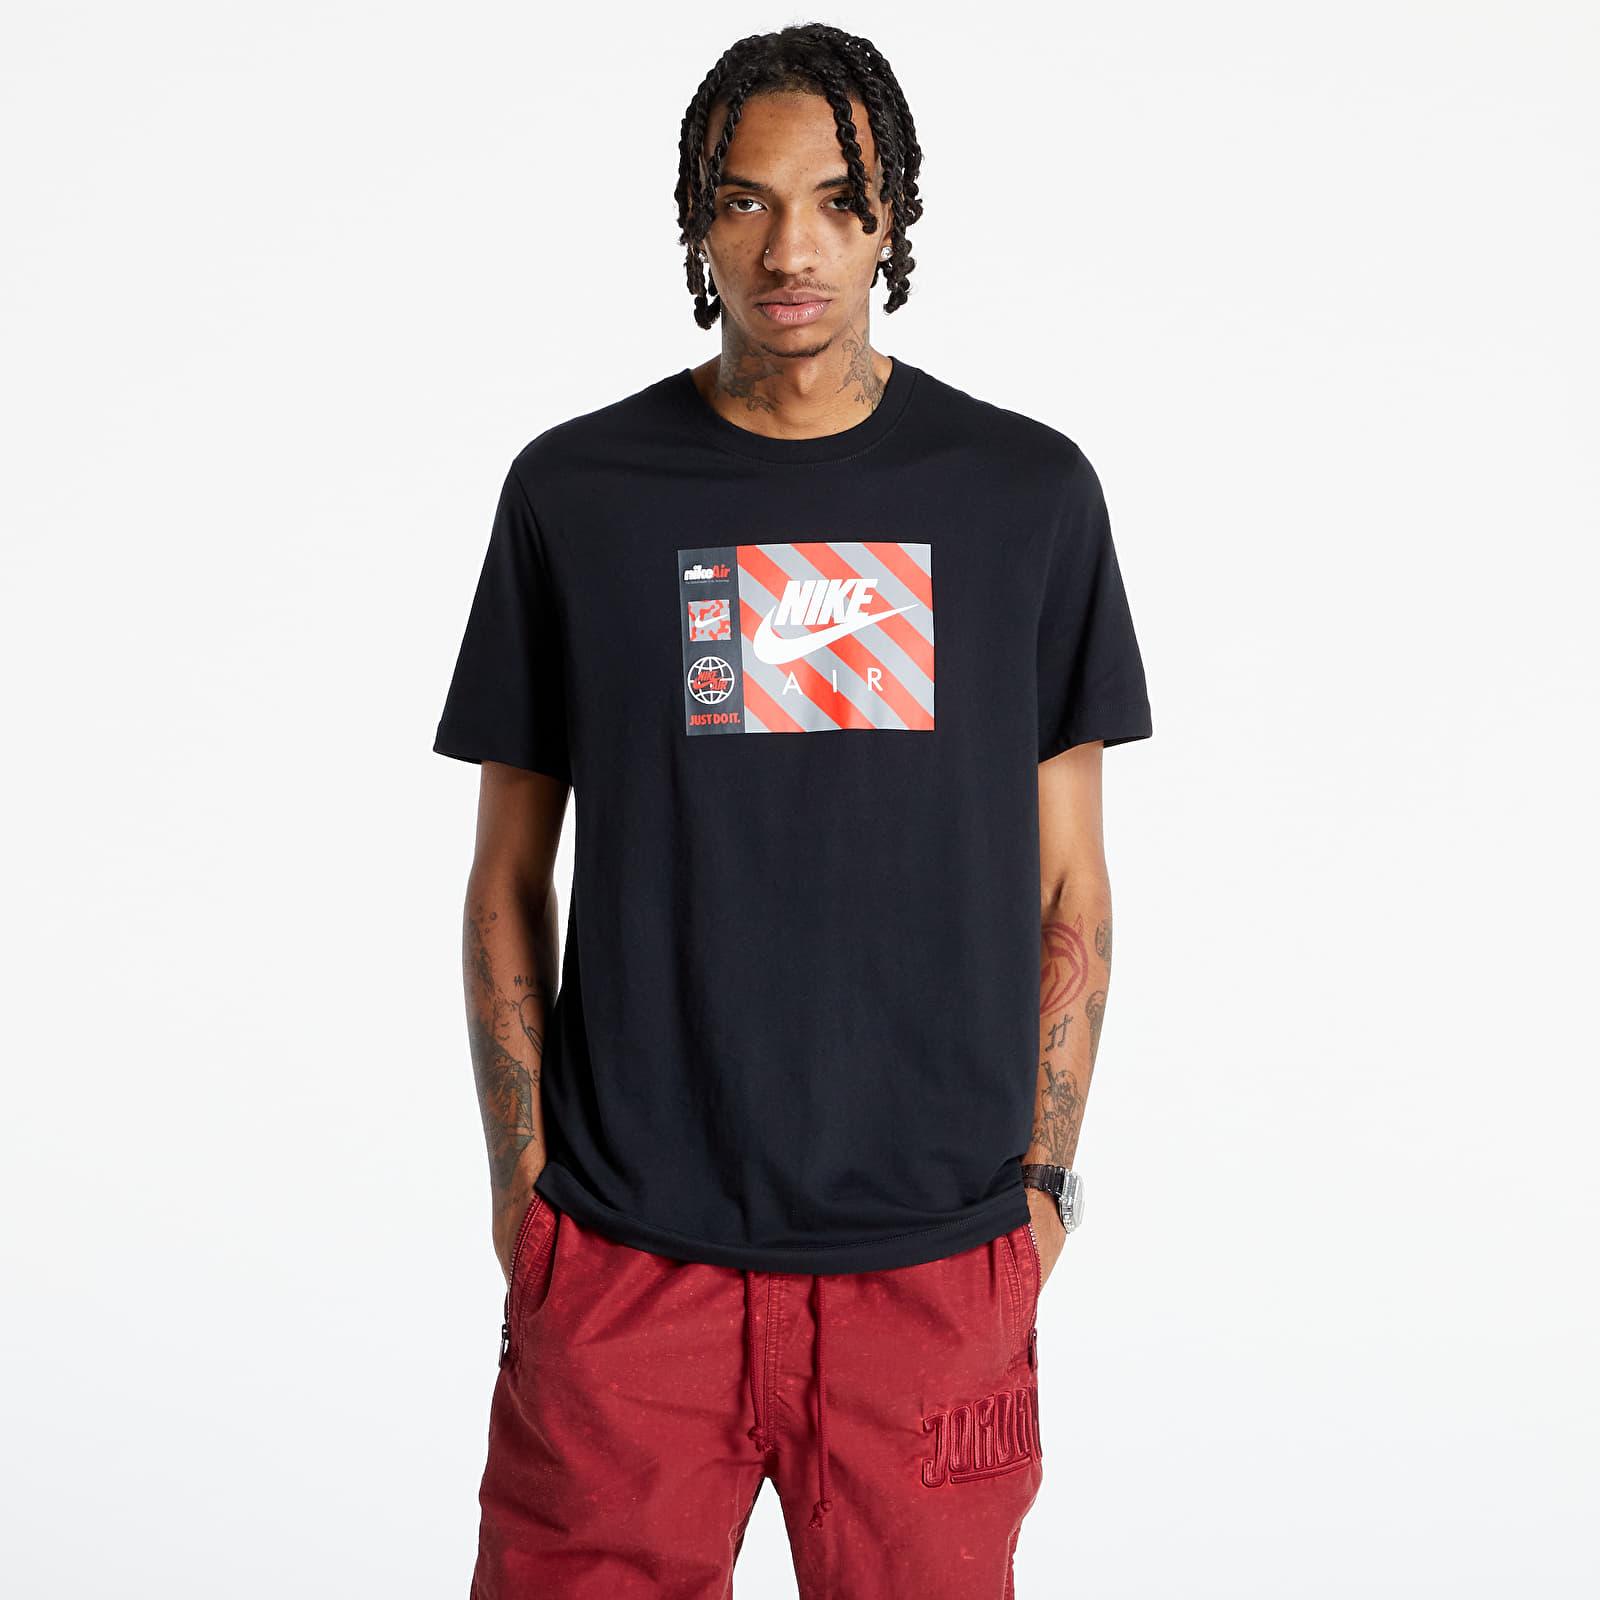 Nike Sportswear M Nsw Tee Swoosh By Air Hbr Black S